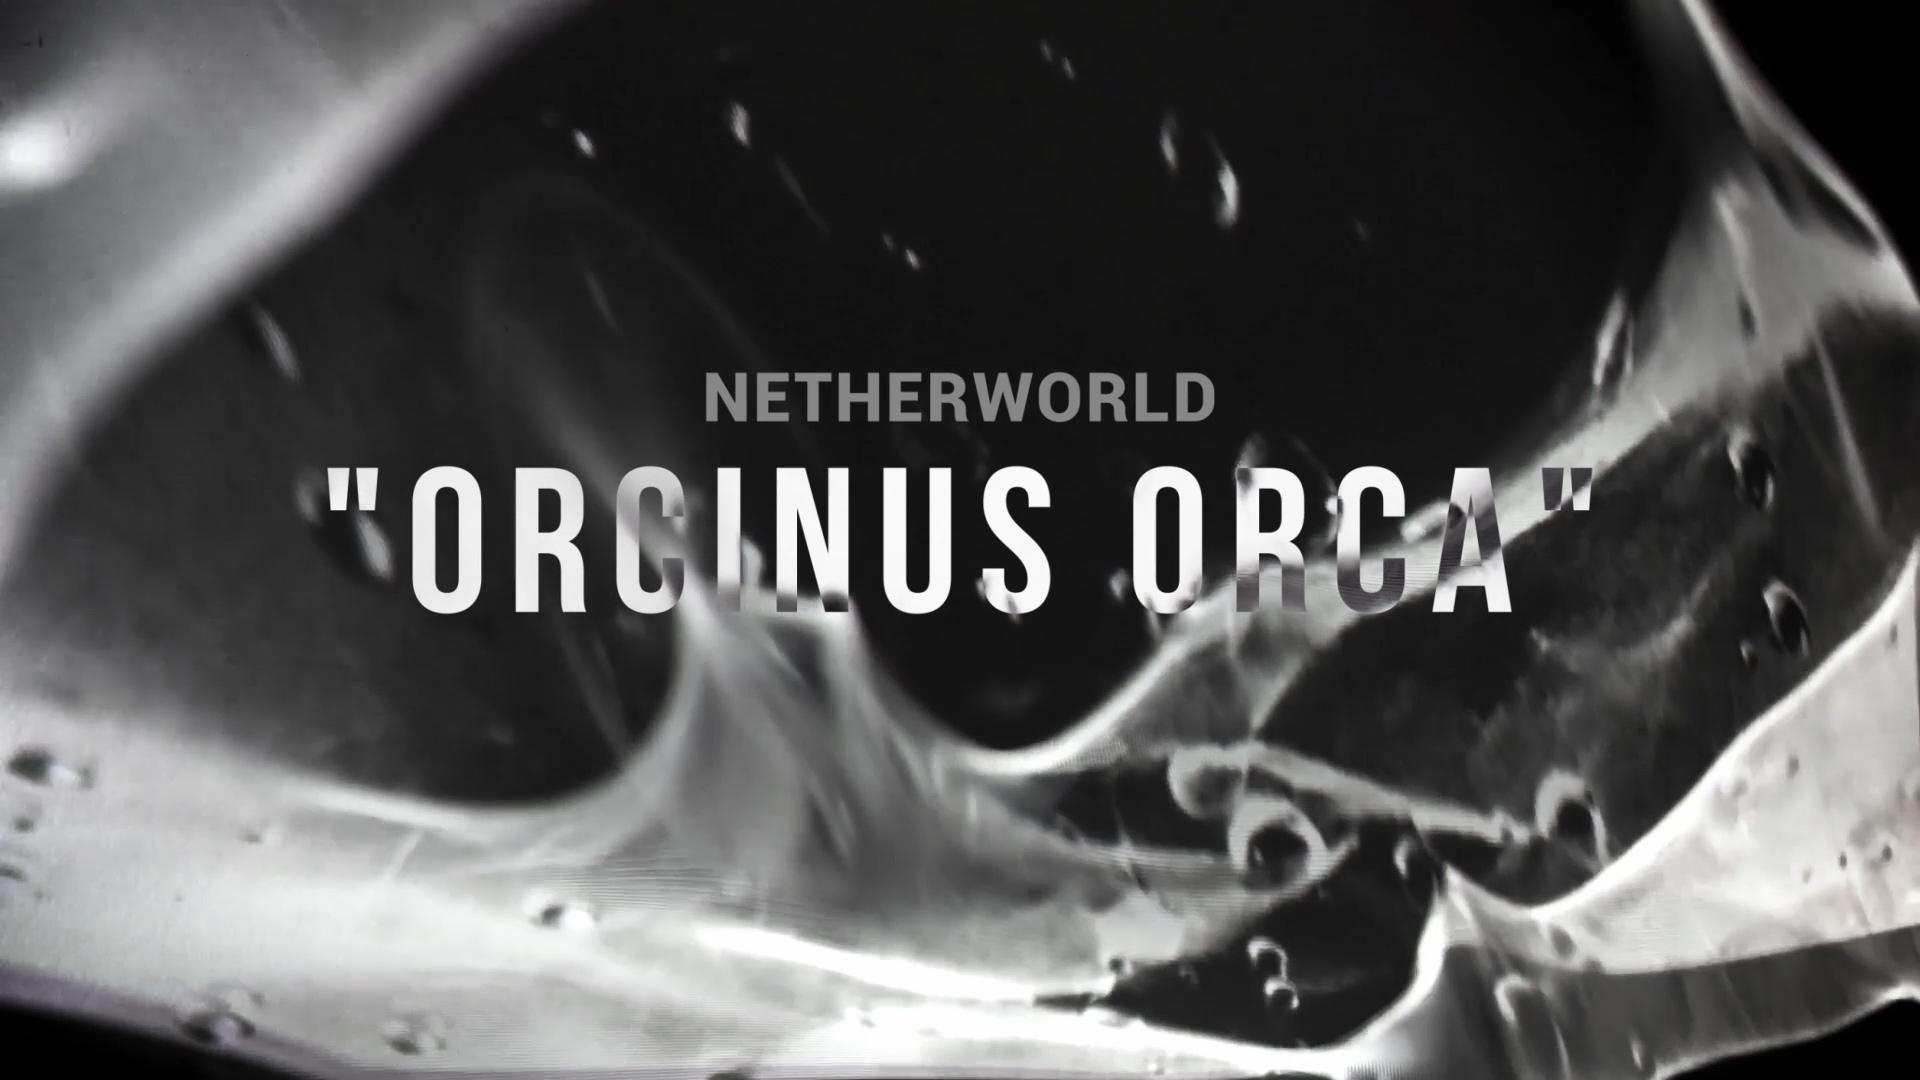 Naslovna. Orcinus orca_w-titles.00_00_05_10.Still023